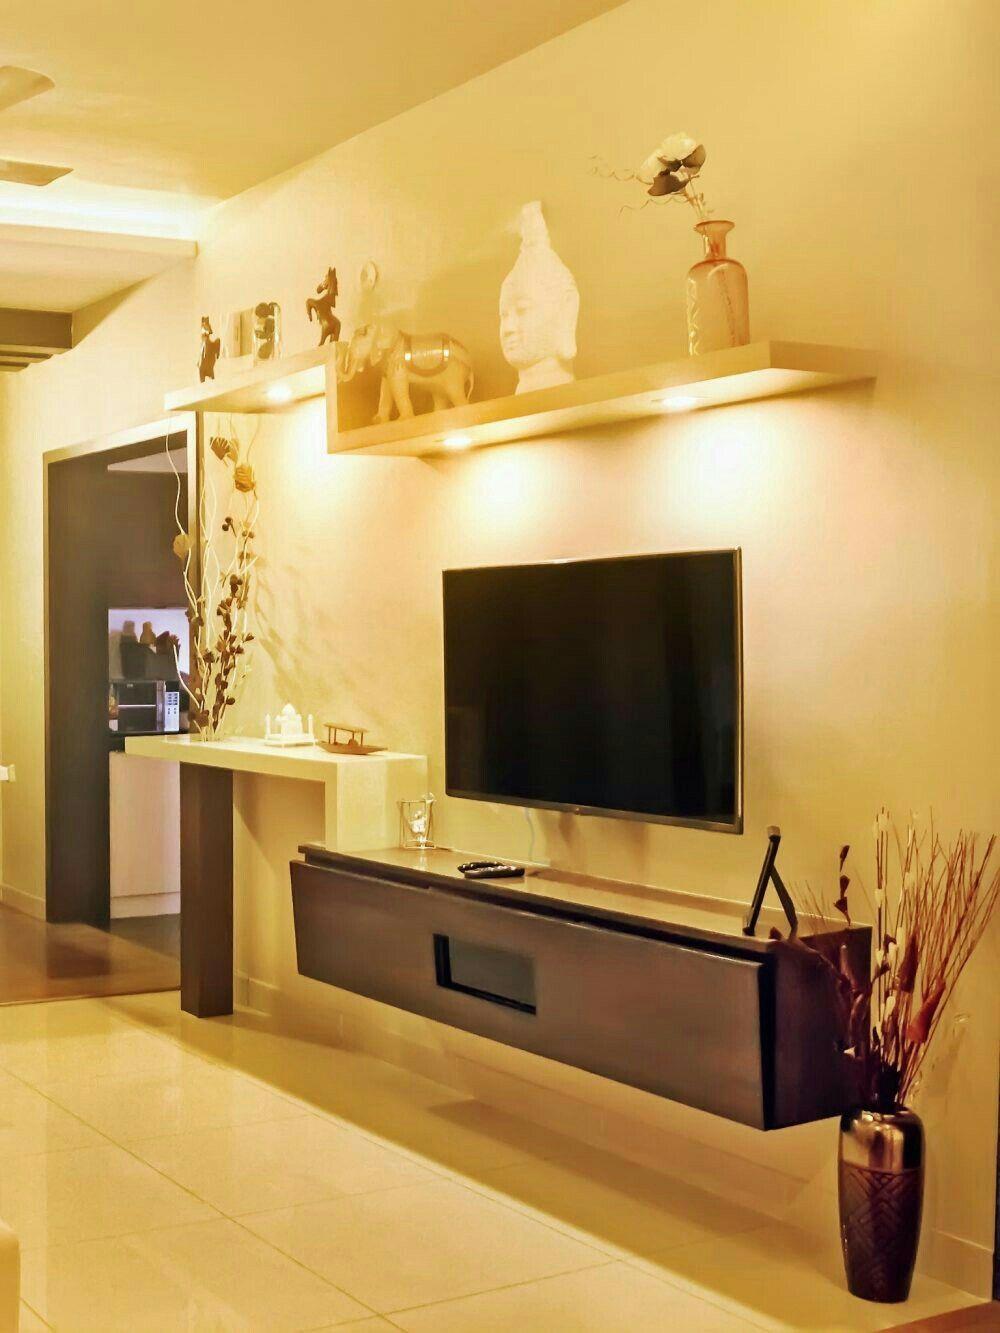 Pinnamrata Shanbhogue On Home Ideas  Pinterest  Tv Walls Tv Inspiration Dining Room Wall Units Inspiration Design